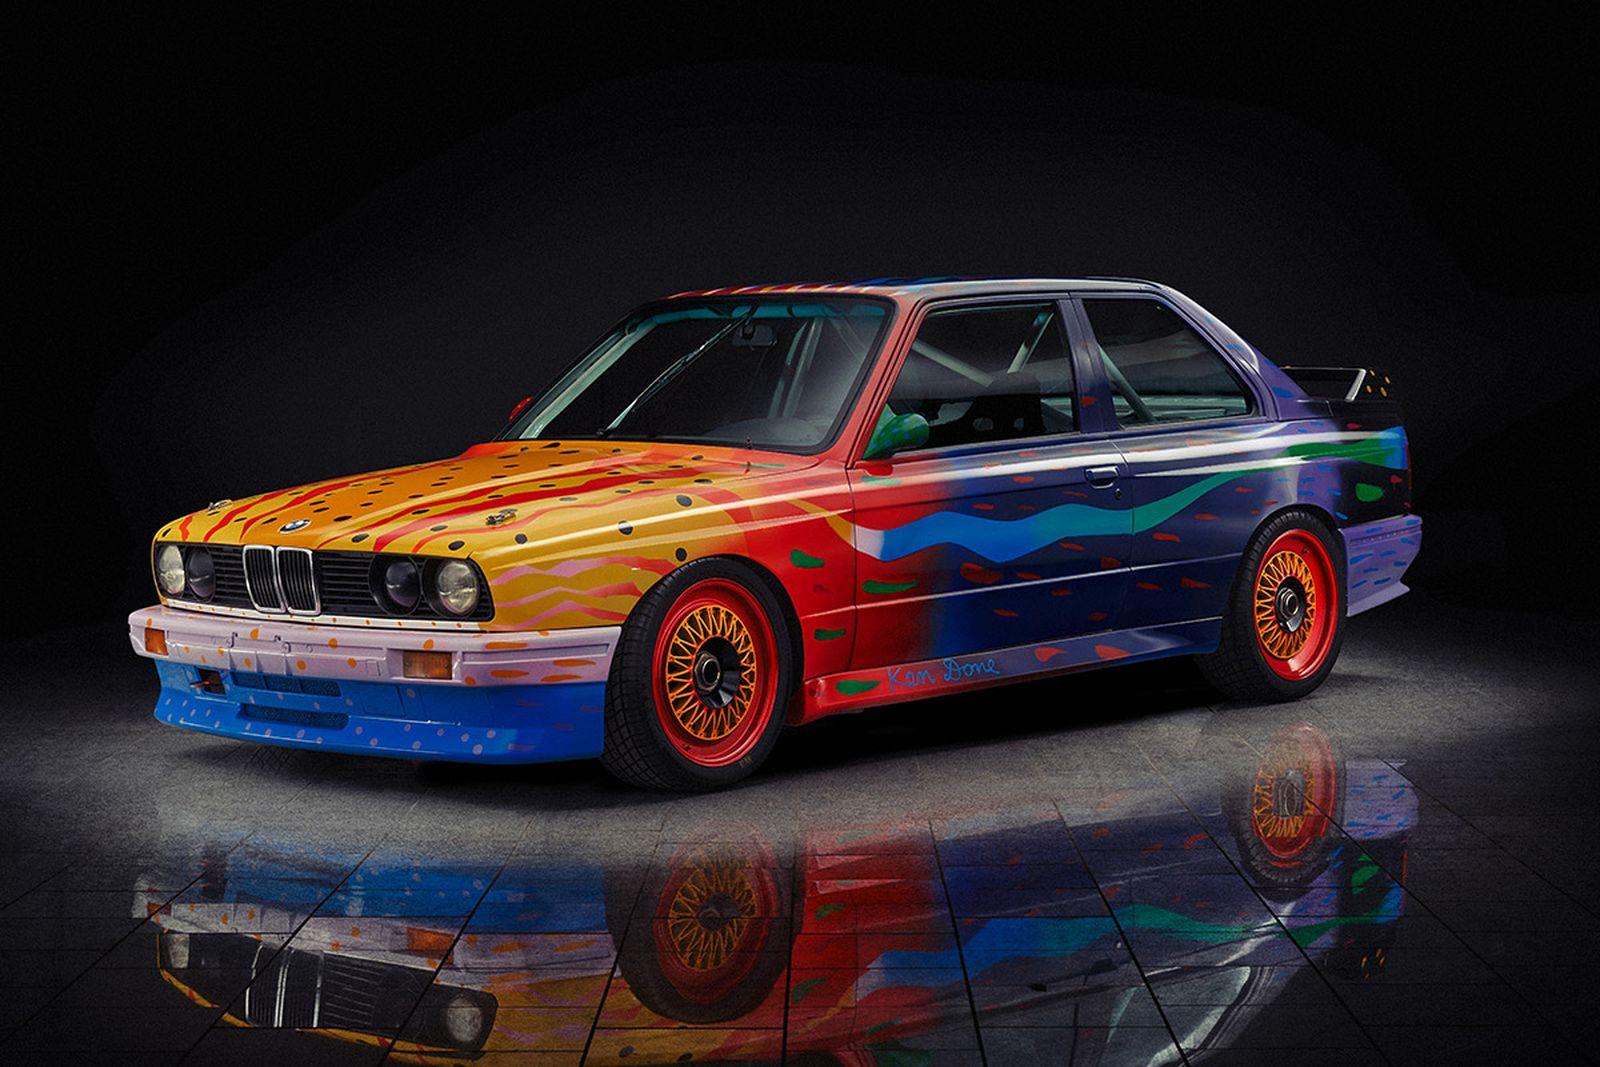 BMW Art Car 08, Ken Done, 1989